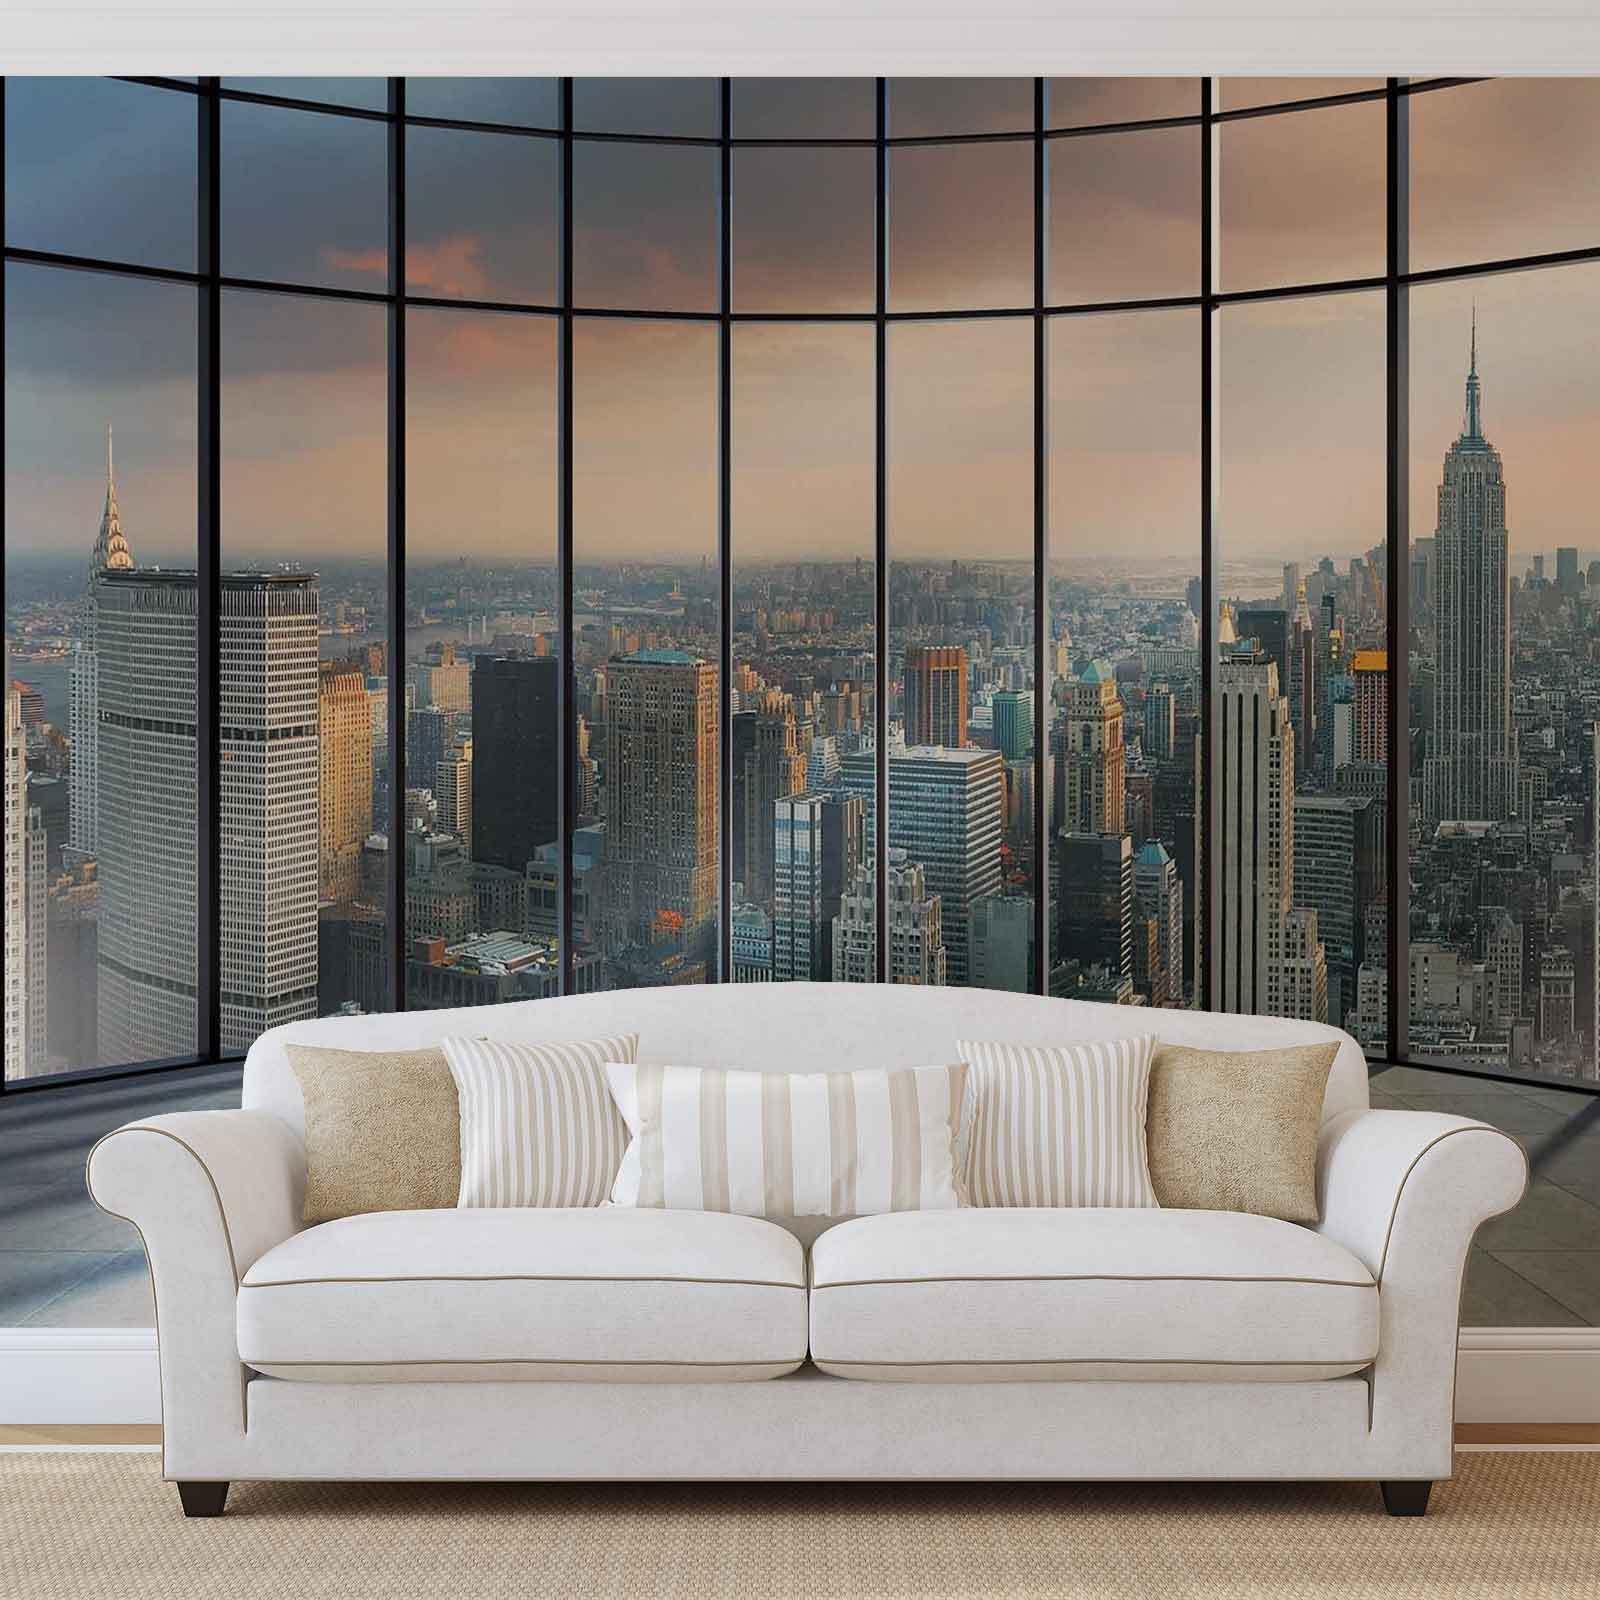 WALL MURAL PHOTO WALLPAPER XXL View New York City (1510WS)